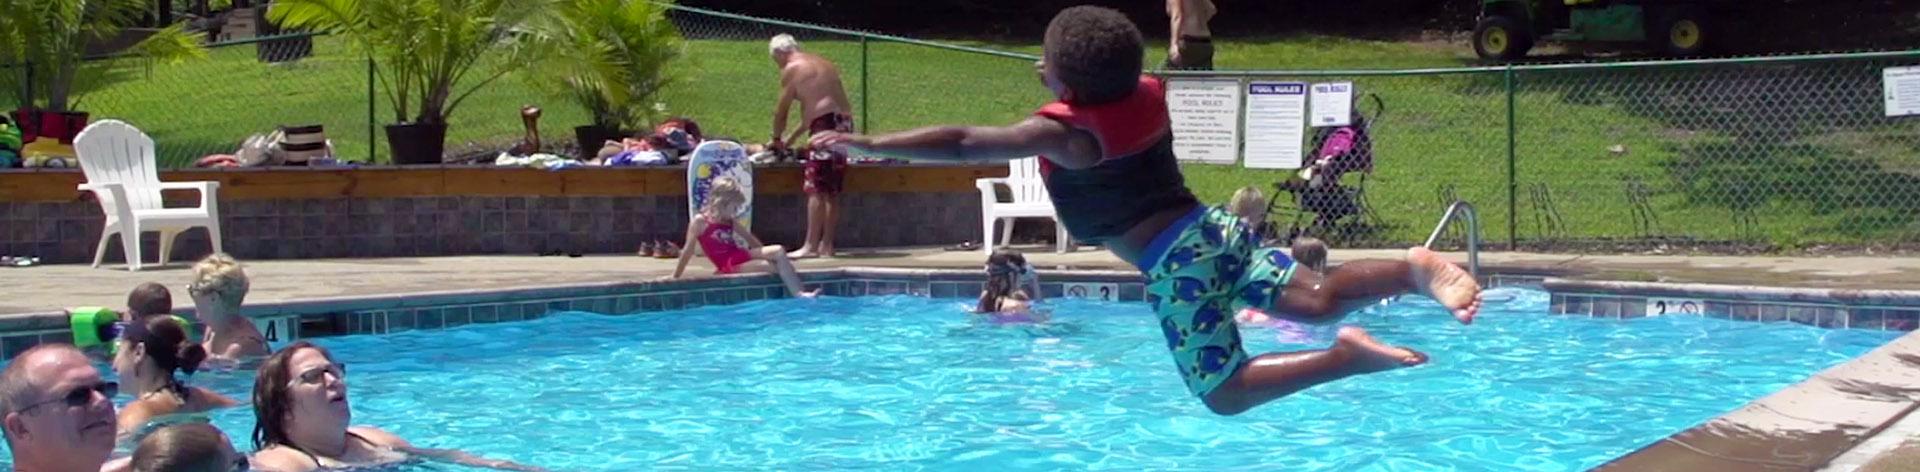 Swimming Pool Fun Stuff : Activities swimming pool horseshoes volleyball